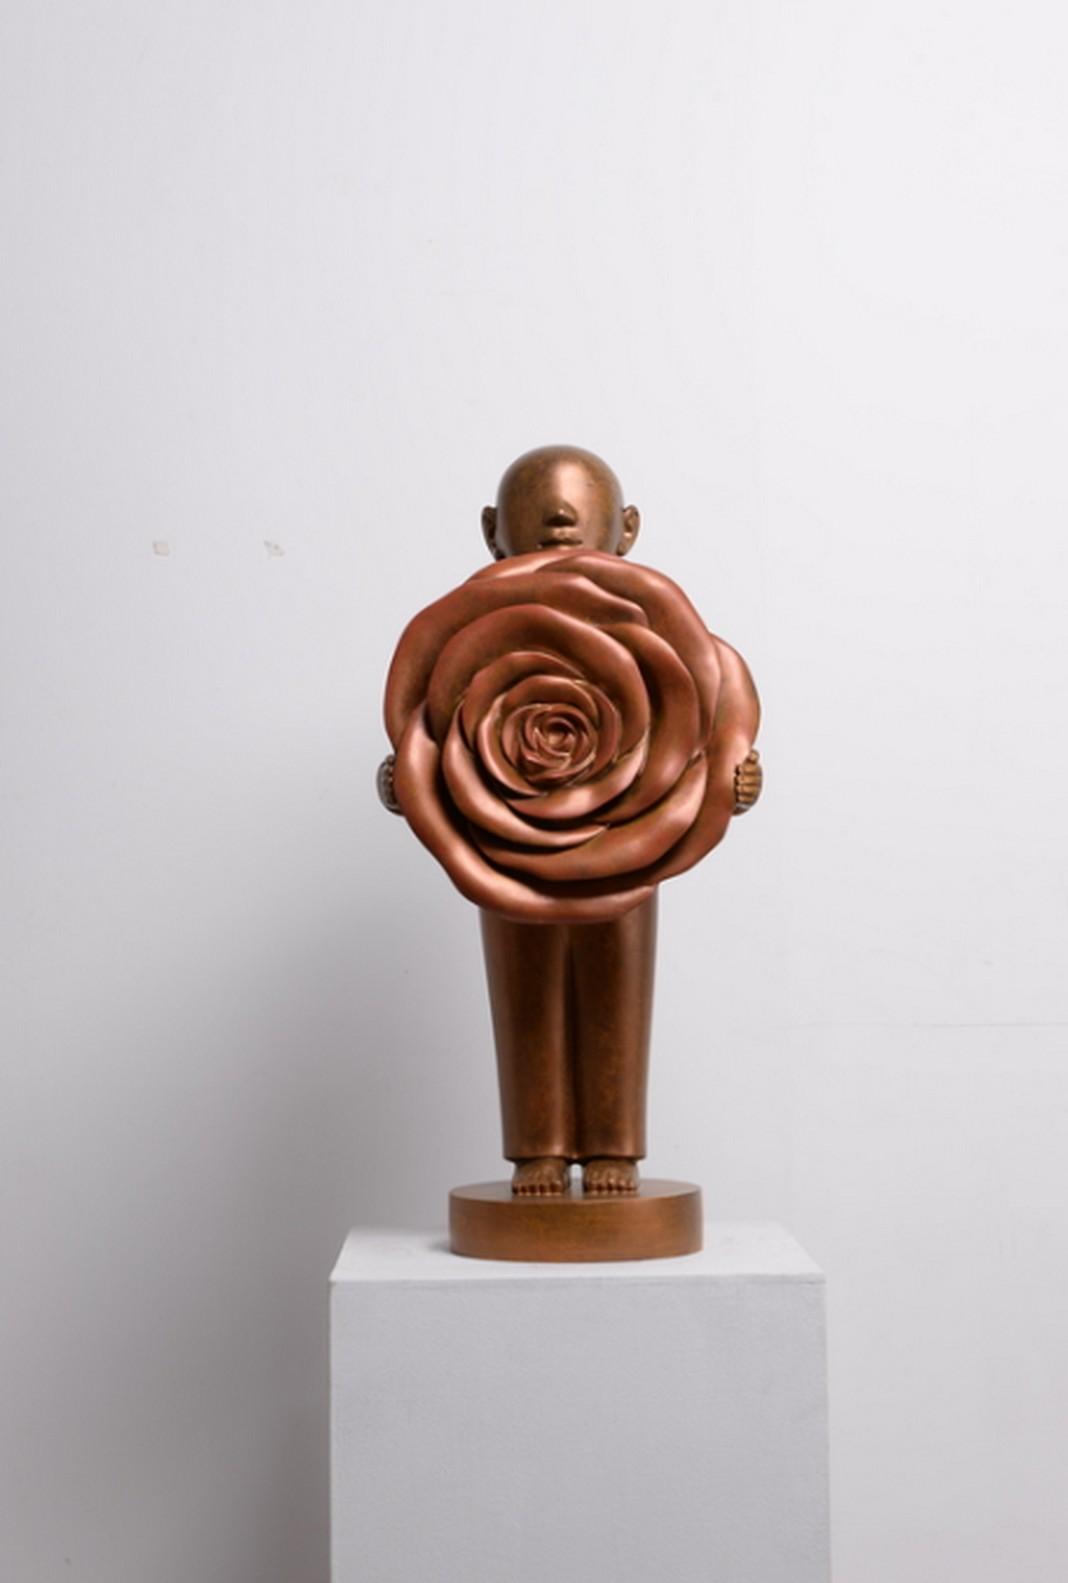 Born in Flowers - Xie Aige